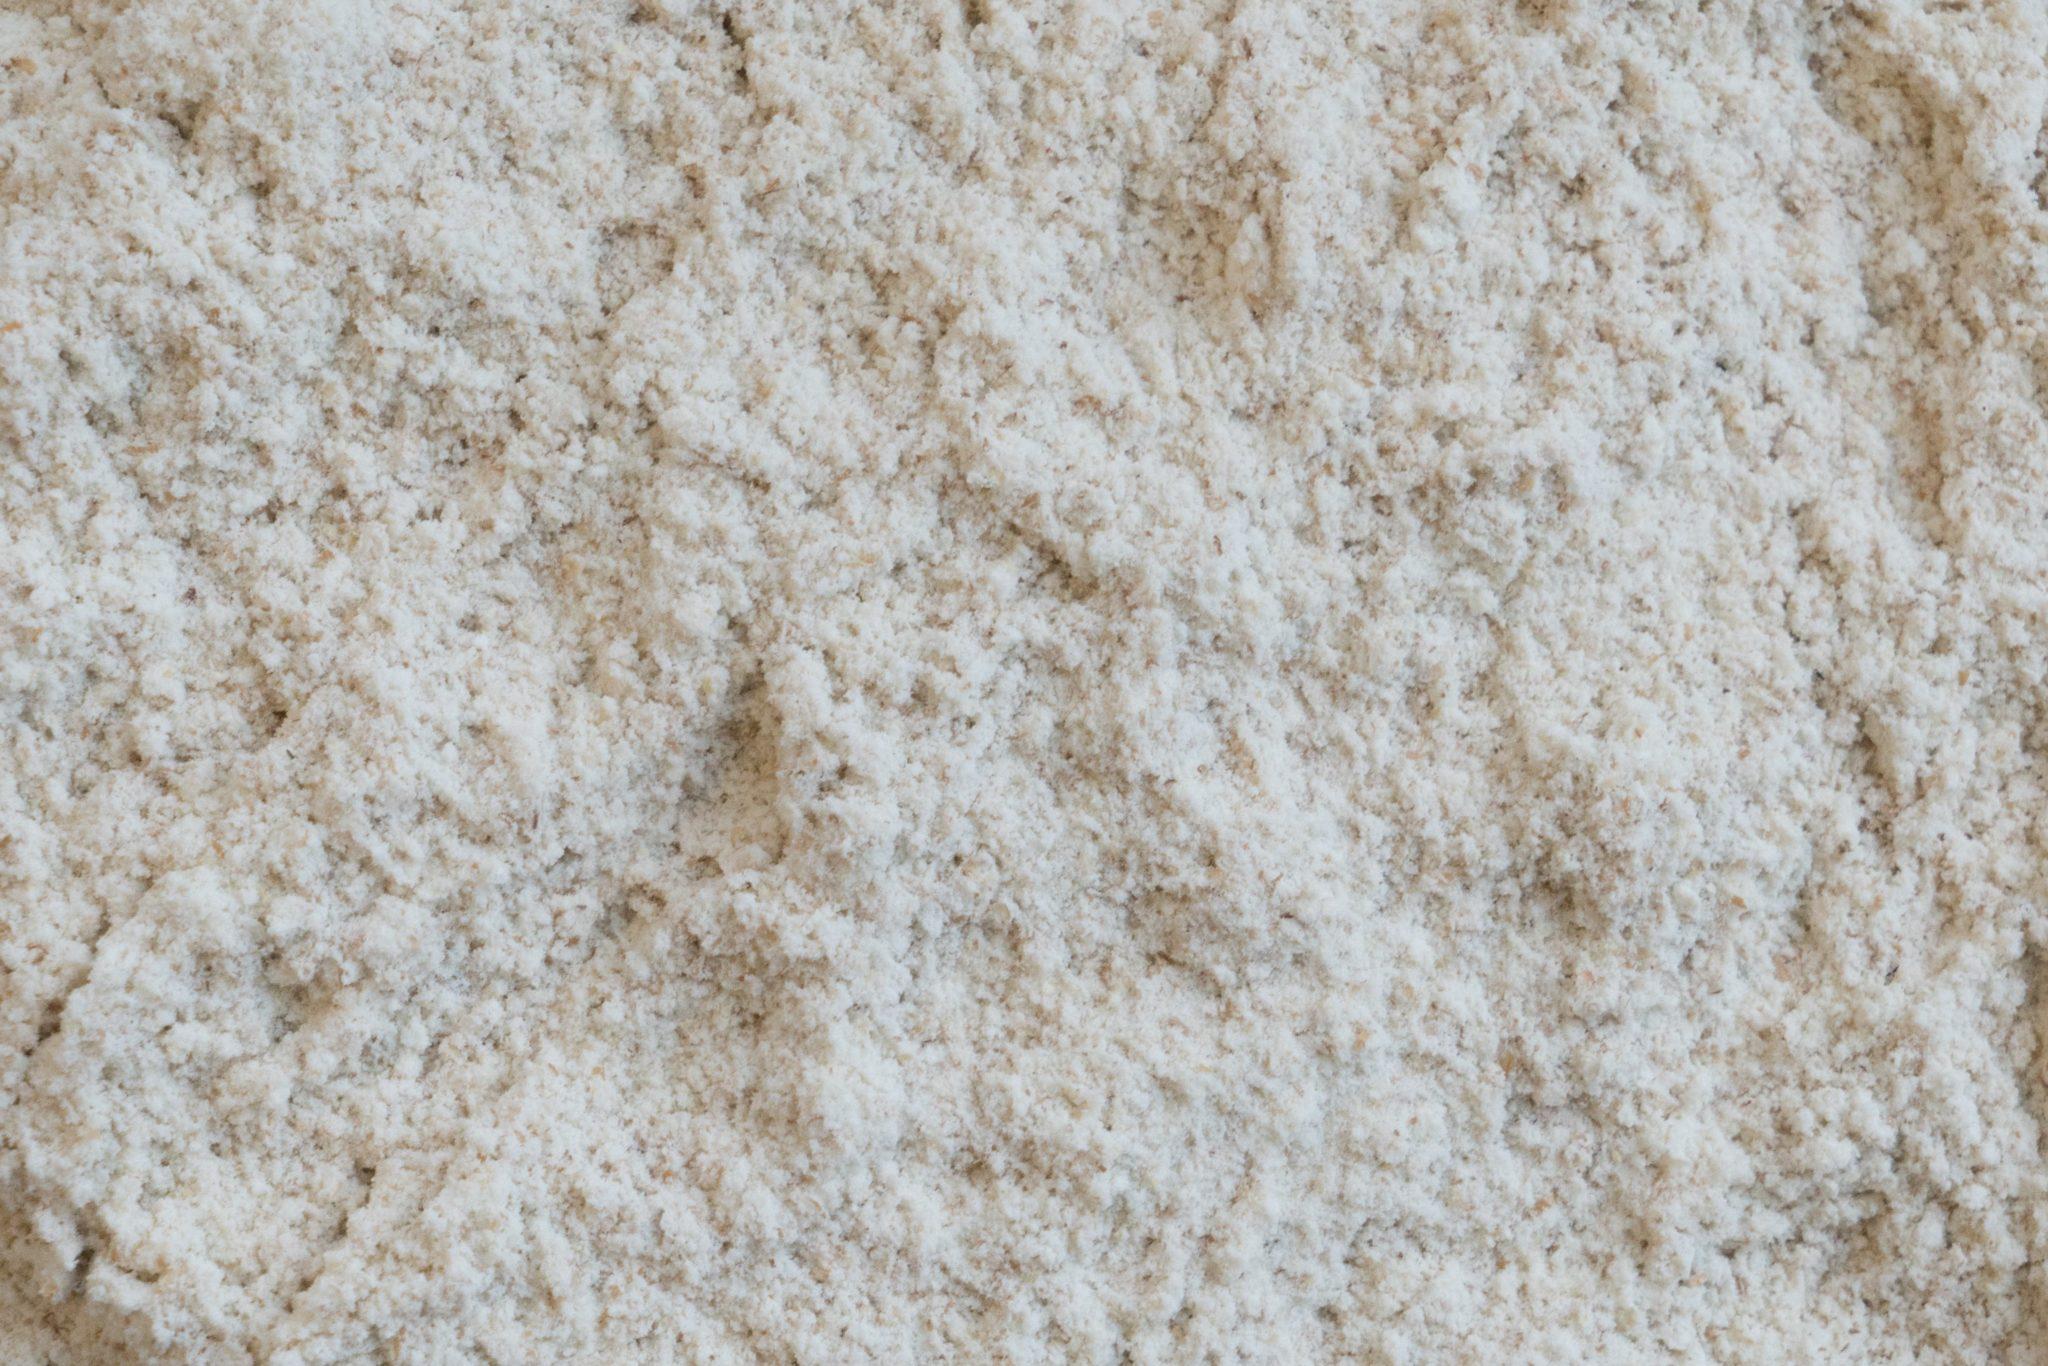 Organic Sifted Wheat (#50) Bread Flour